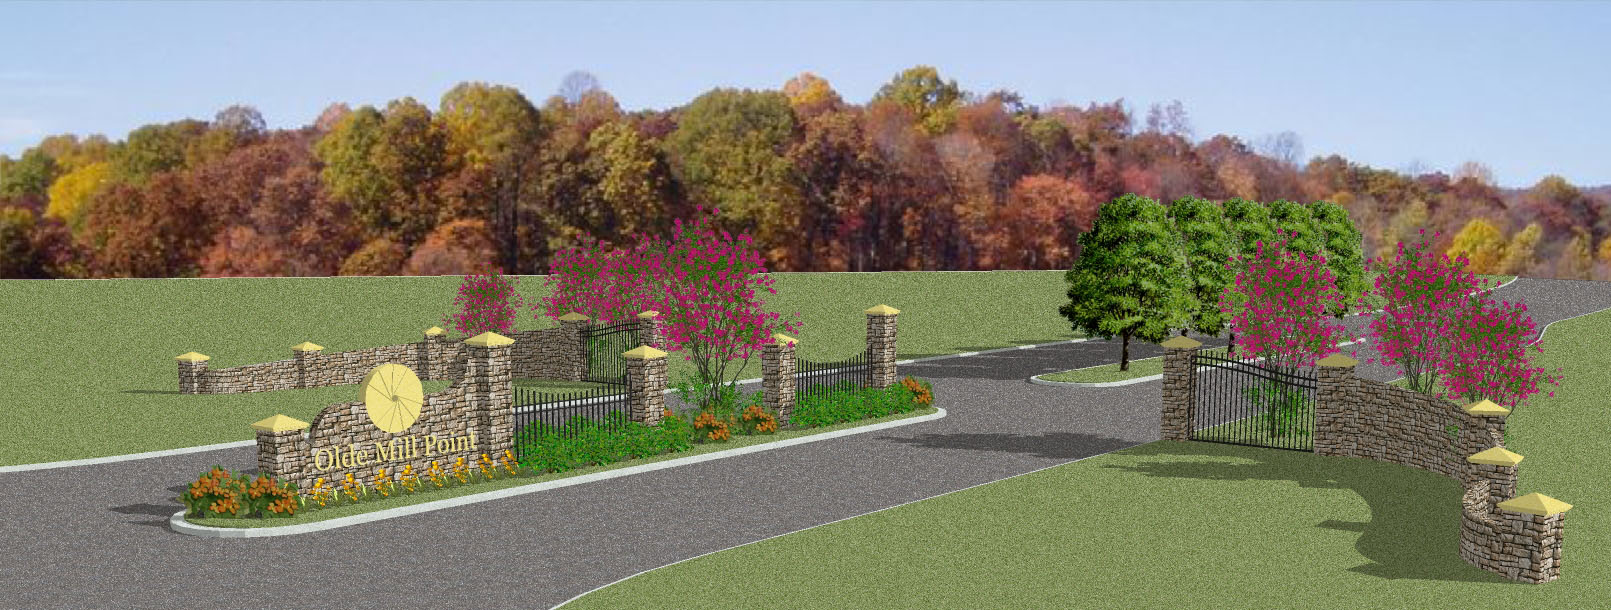 Subdivisions Las Llc Delaware Landscape Architecture